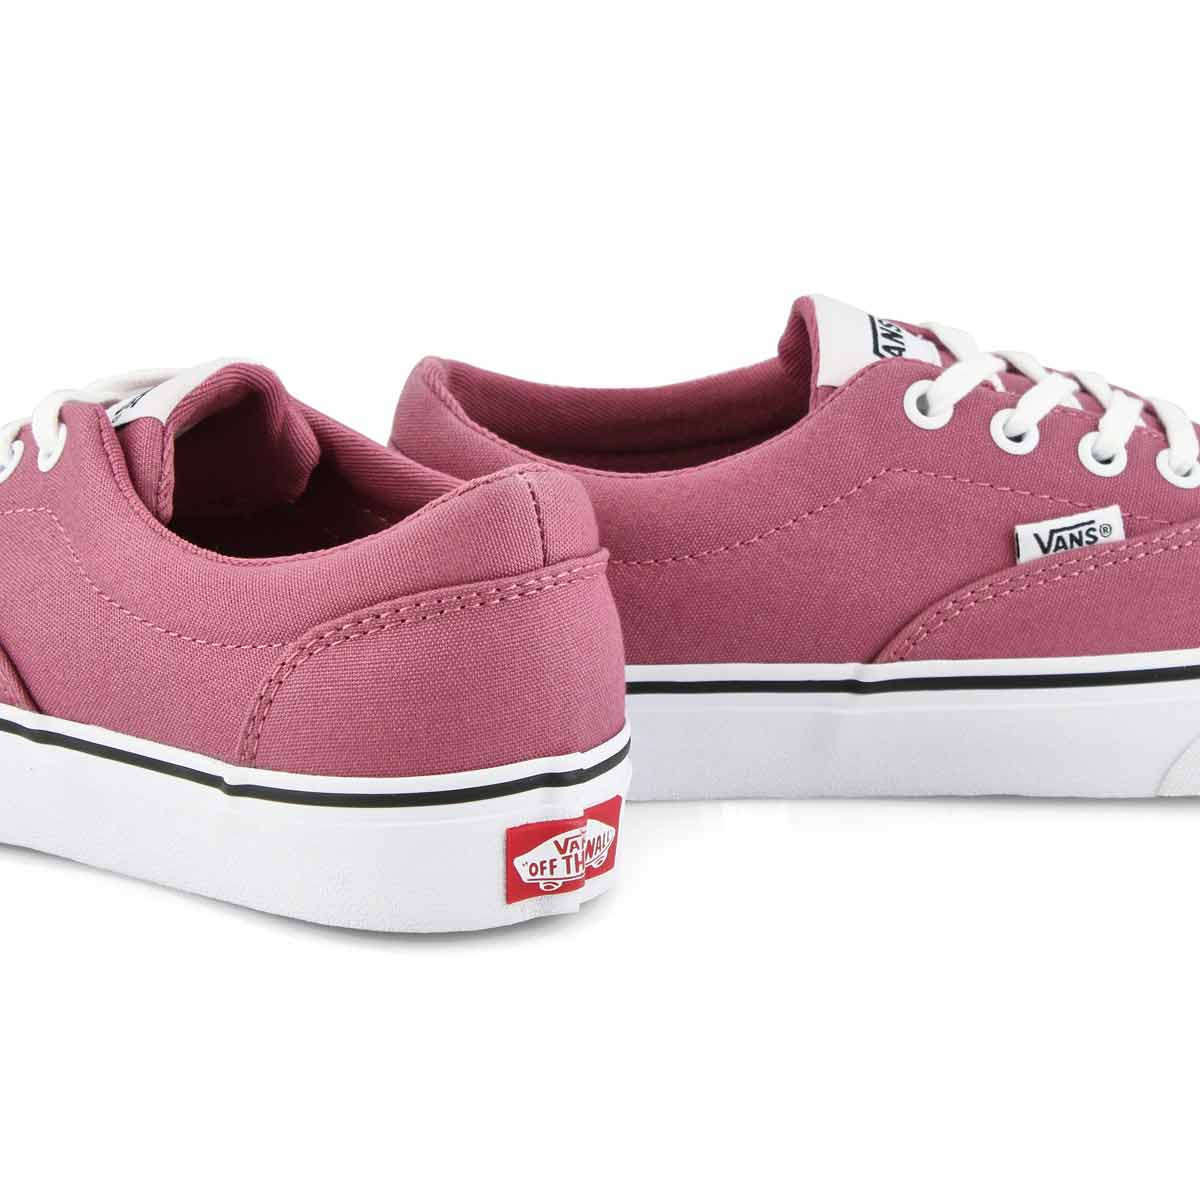 Women's Doheny Sneaker - Heather Rose/White